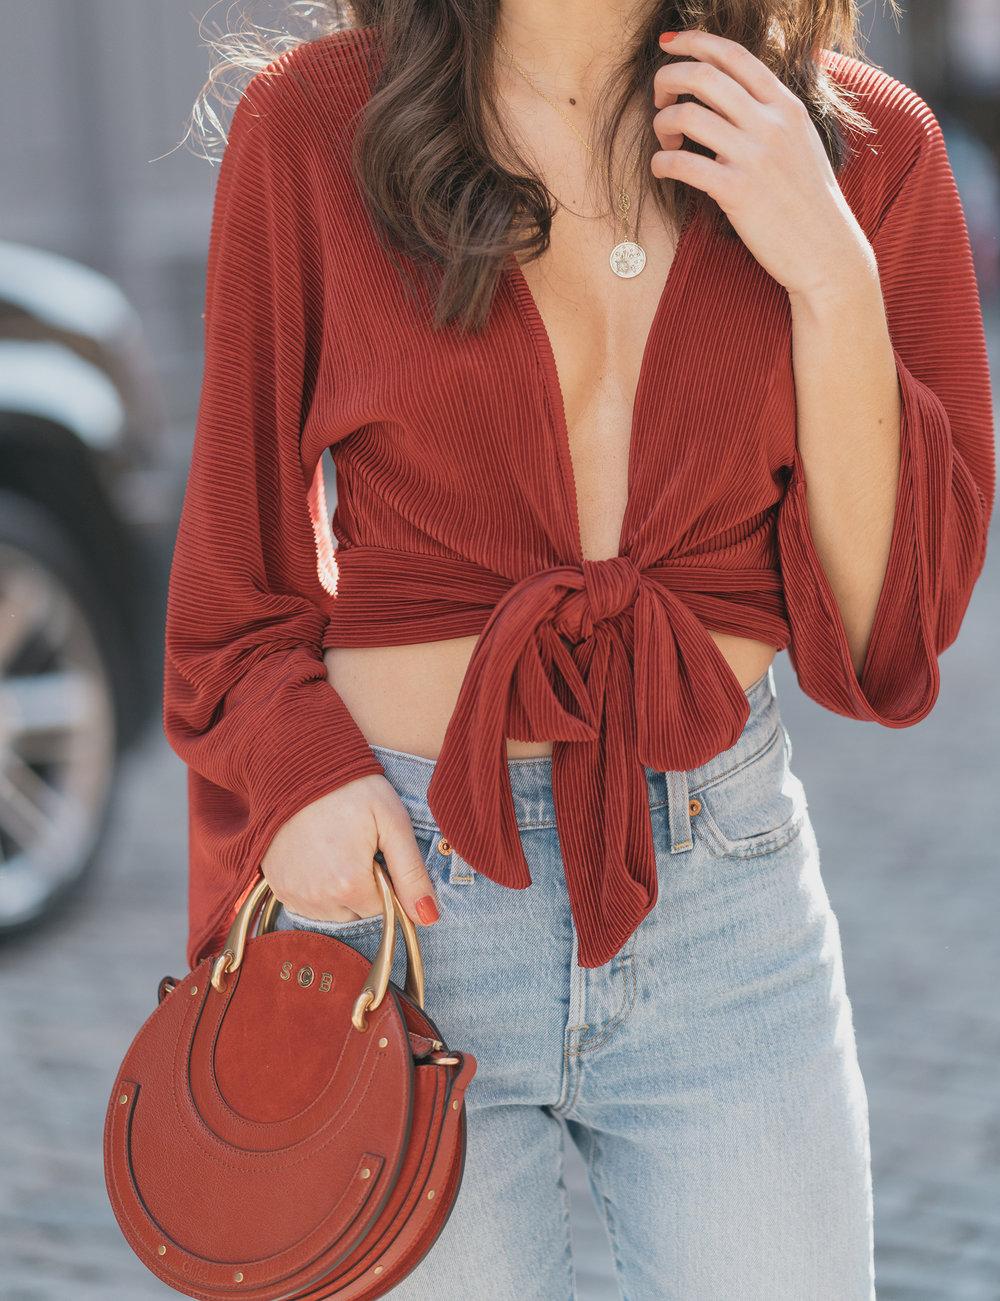 Red-Kimono-Tie-Front-Top-Ruby-Chloe-Pixie-Leather-Crossbody-Bag-8.jpg